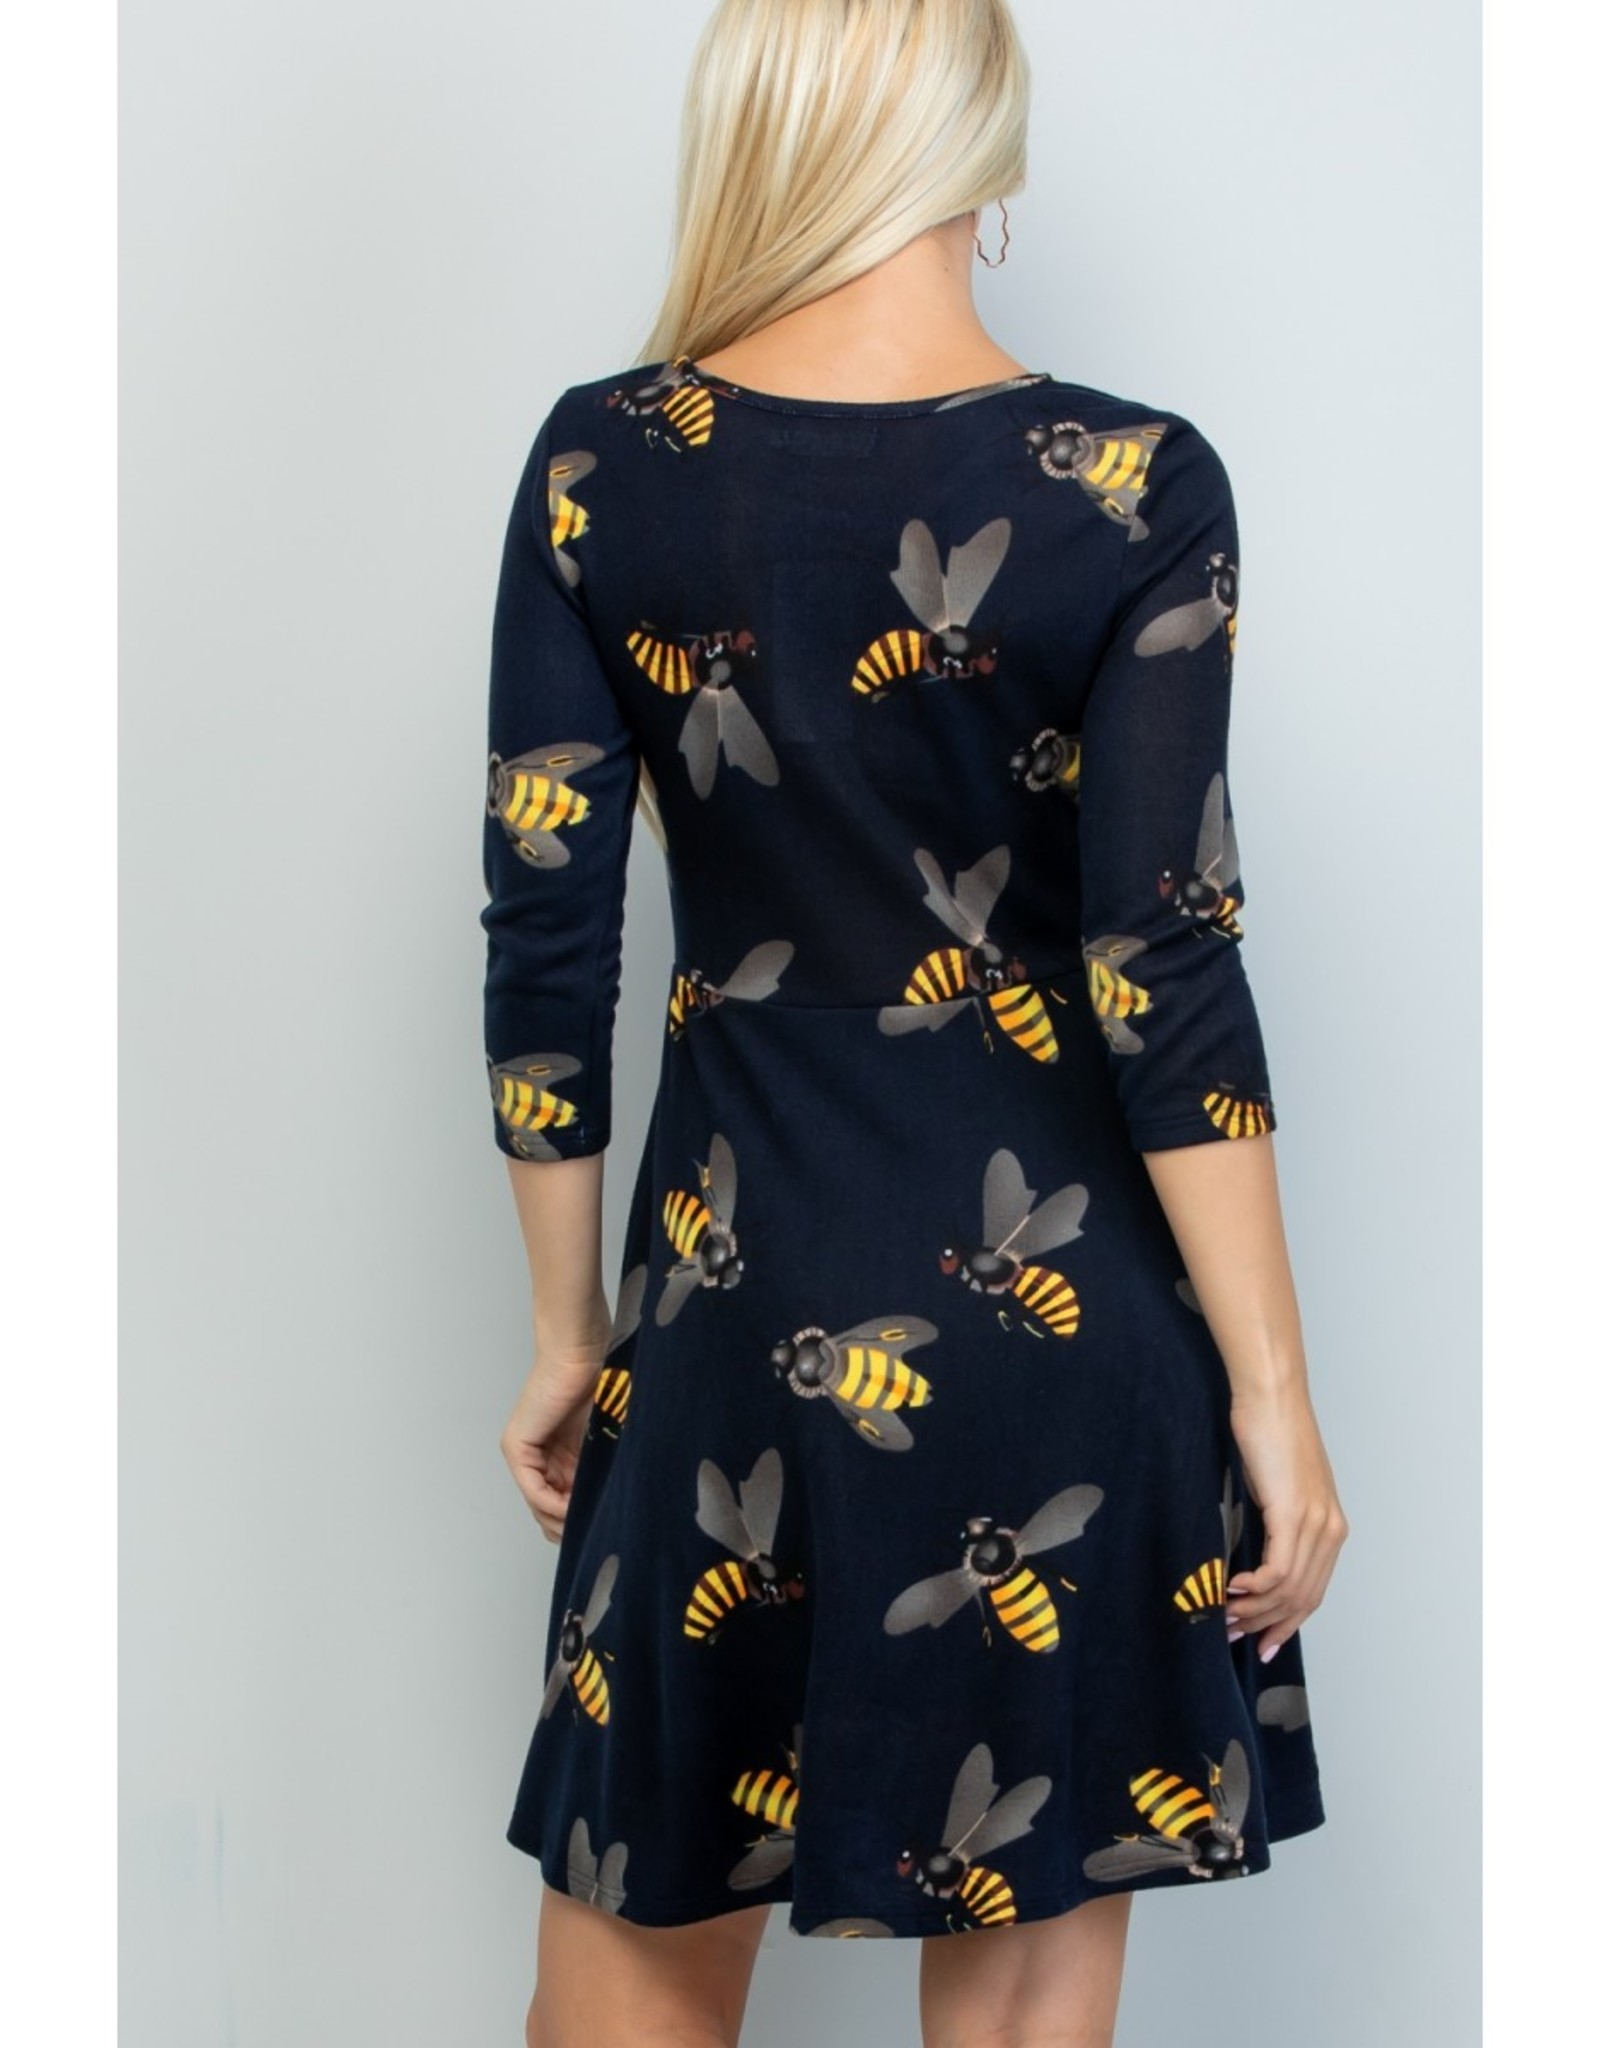 Big Bee Print Tunic Dress